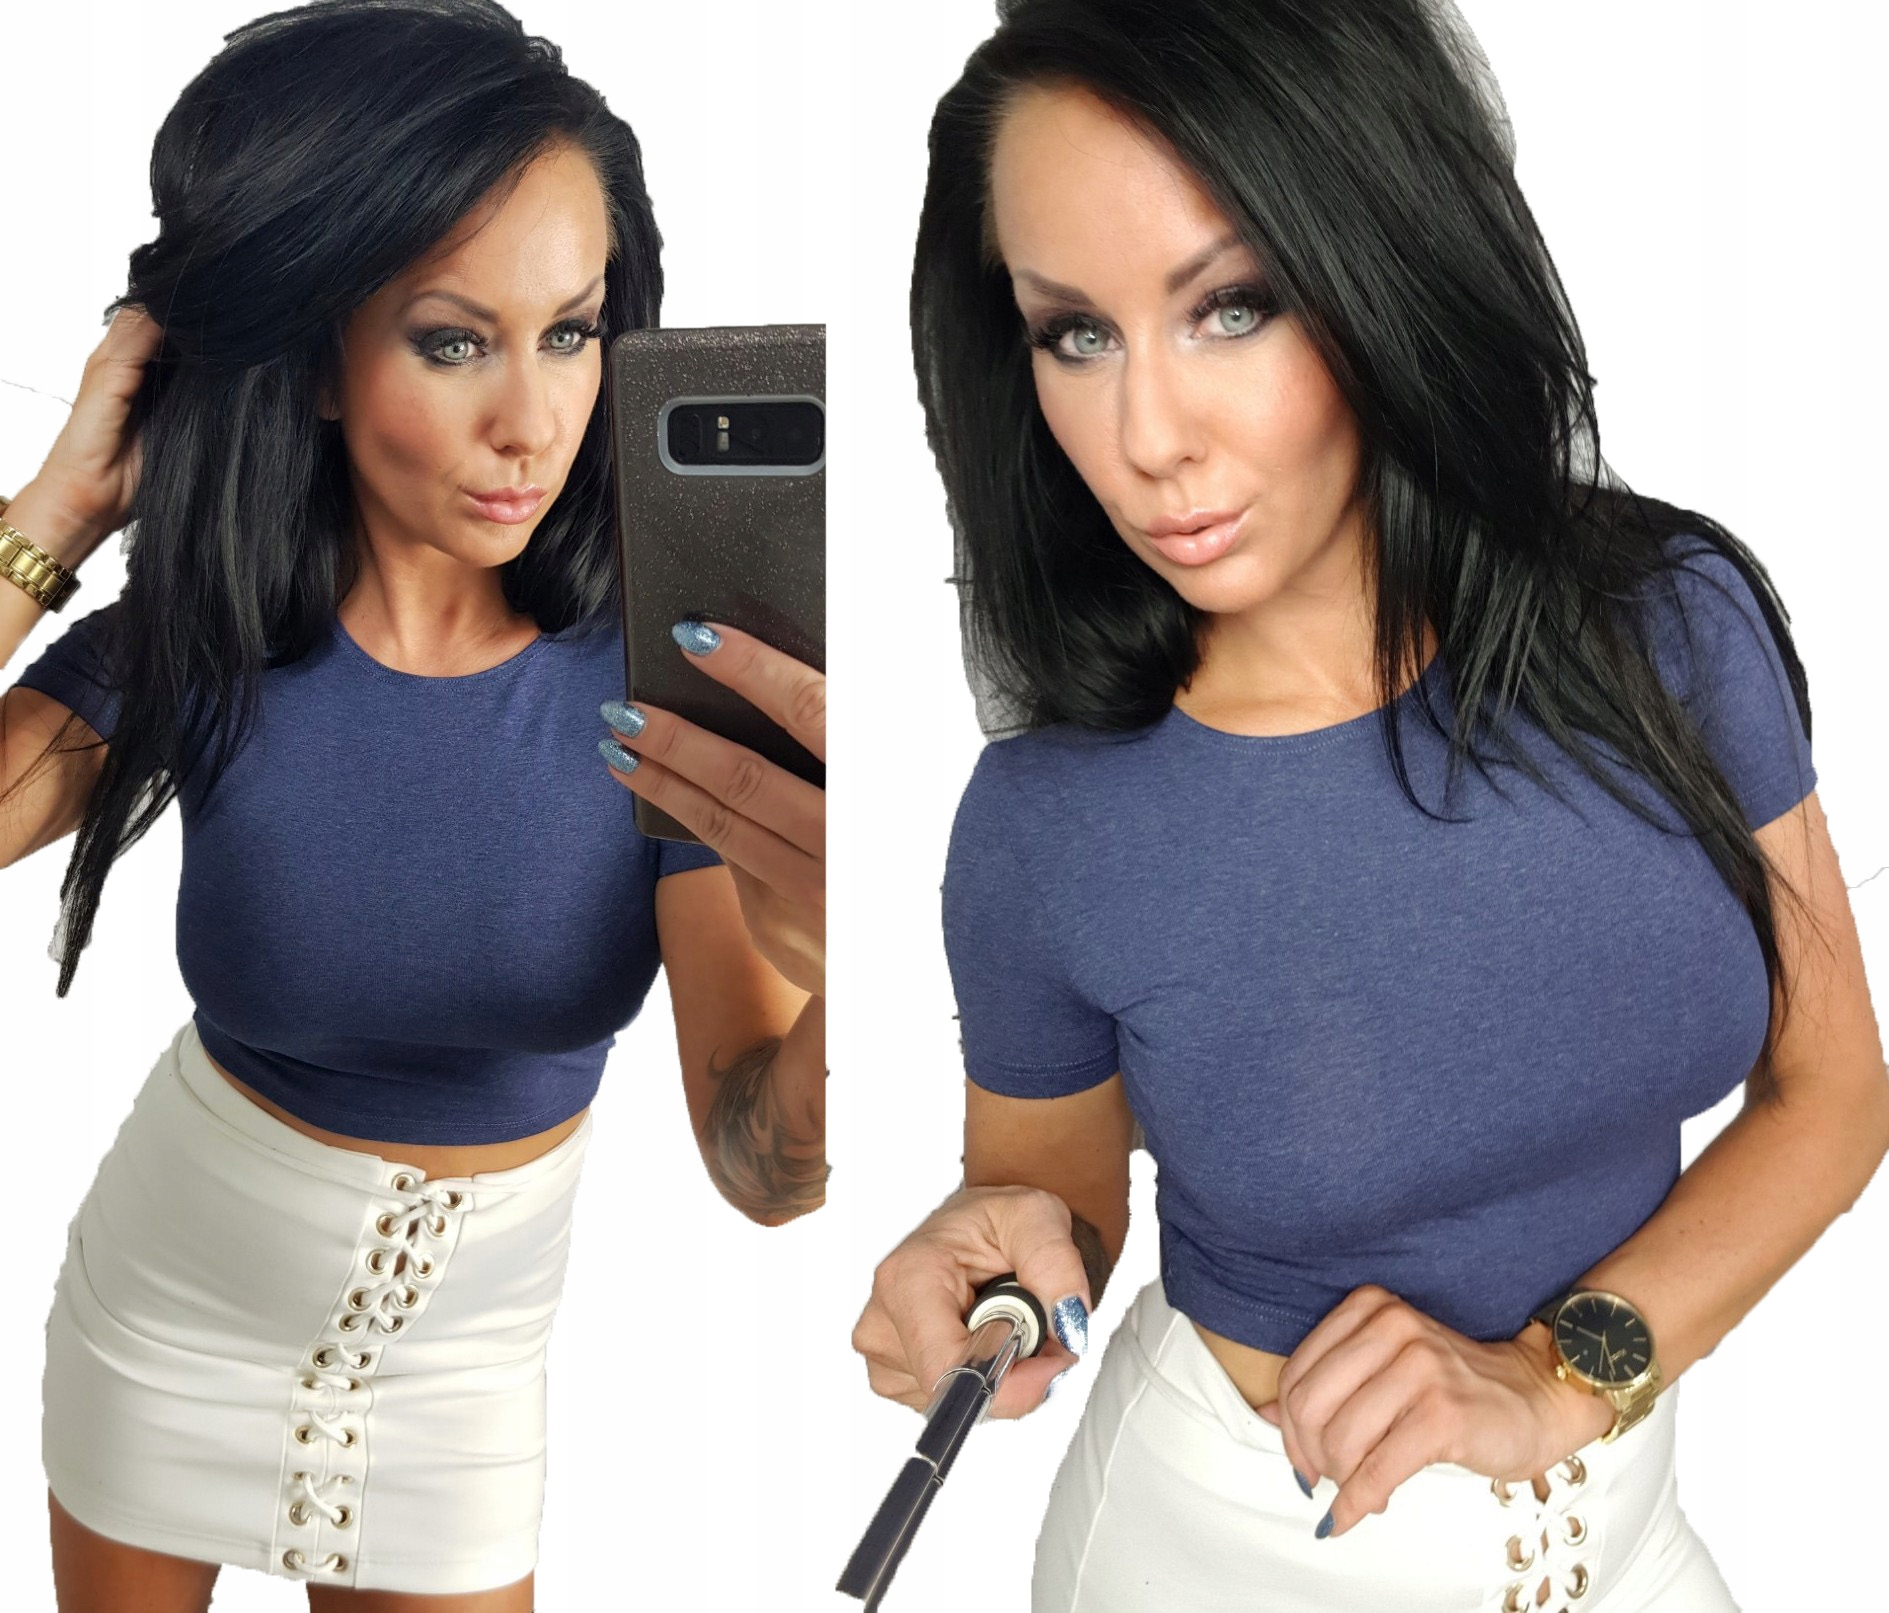 Lipmarkrótka bluzka top must have kolory s 36 Zdjęcie